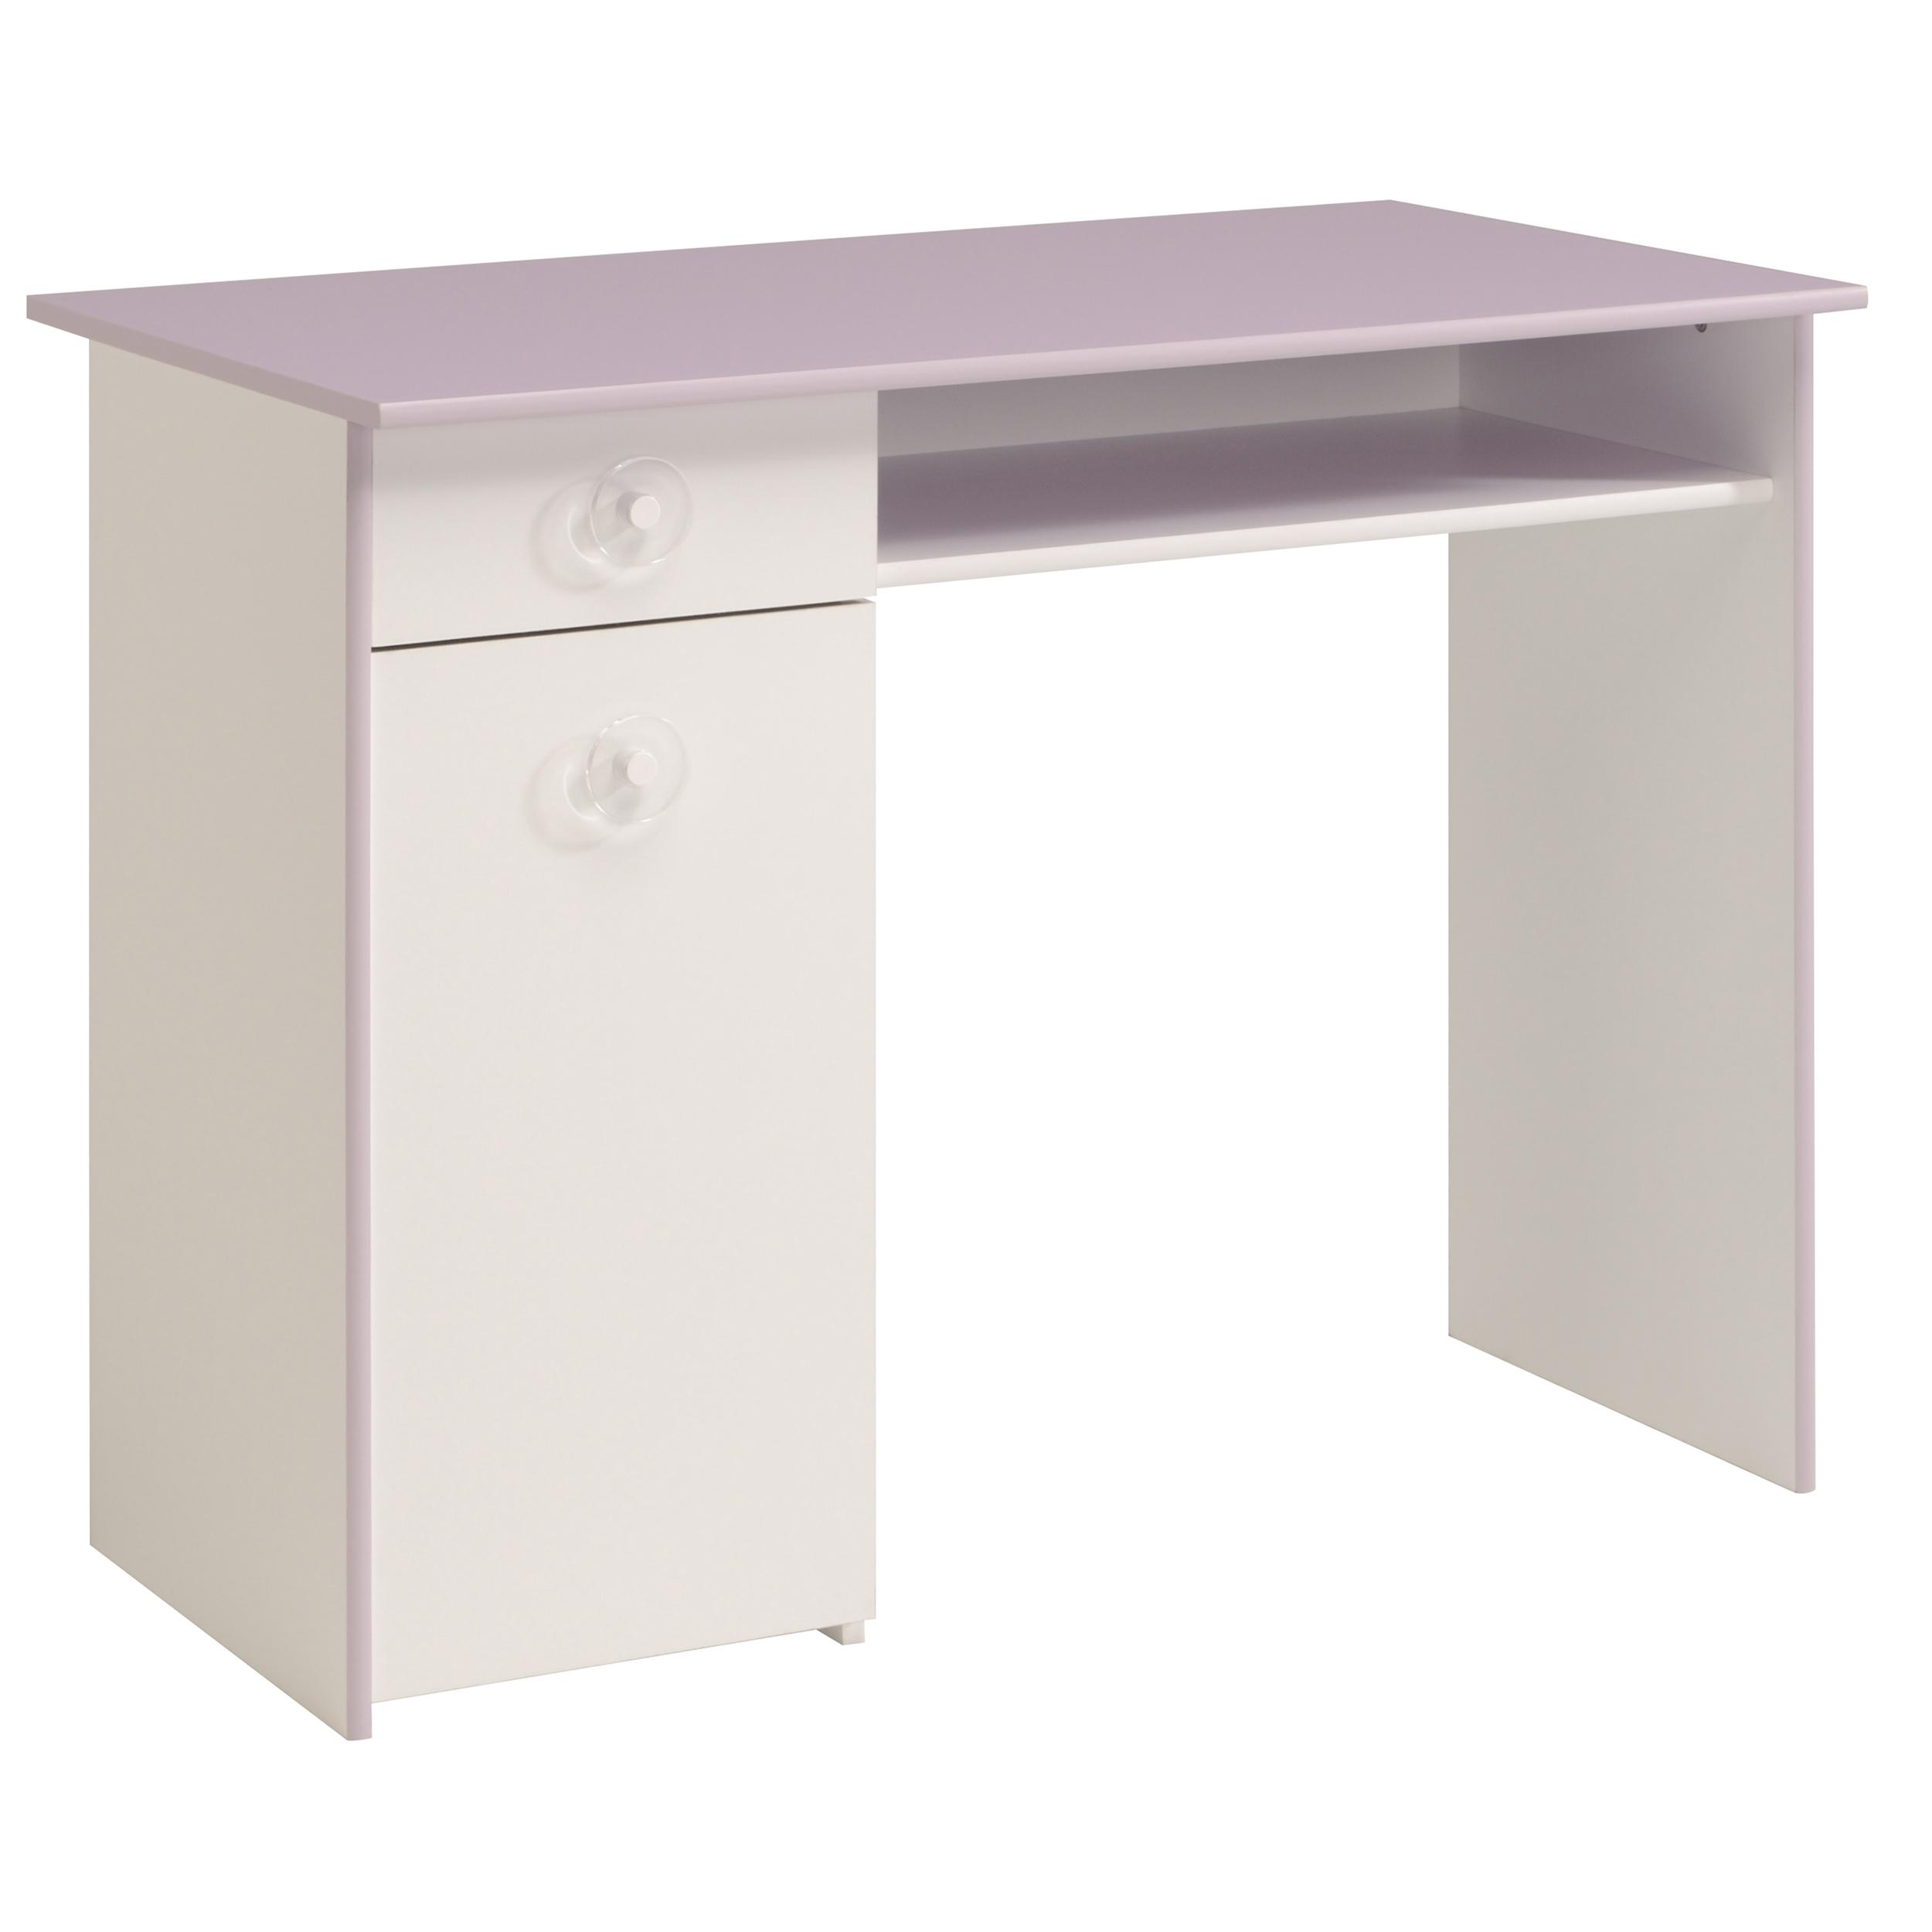 bureau 1 porte 1 tiroir blanc et lilas ombeline. Black Bedroom Furniture Sets. Home Design Ideas